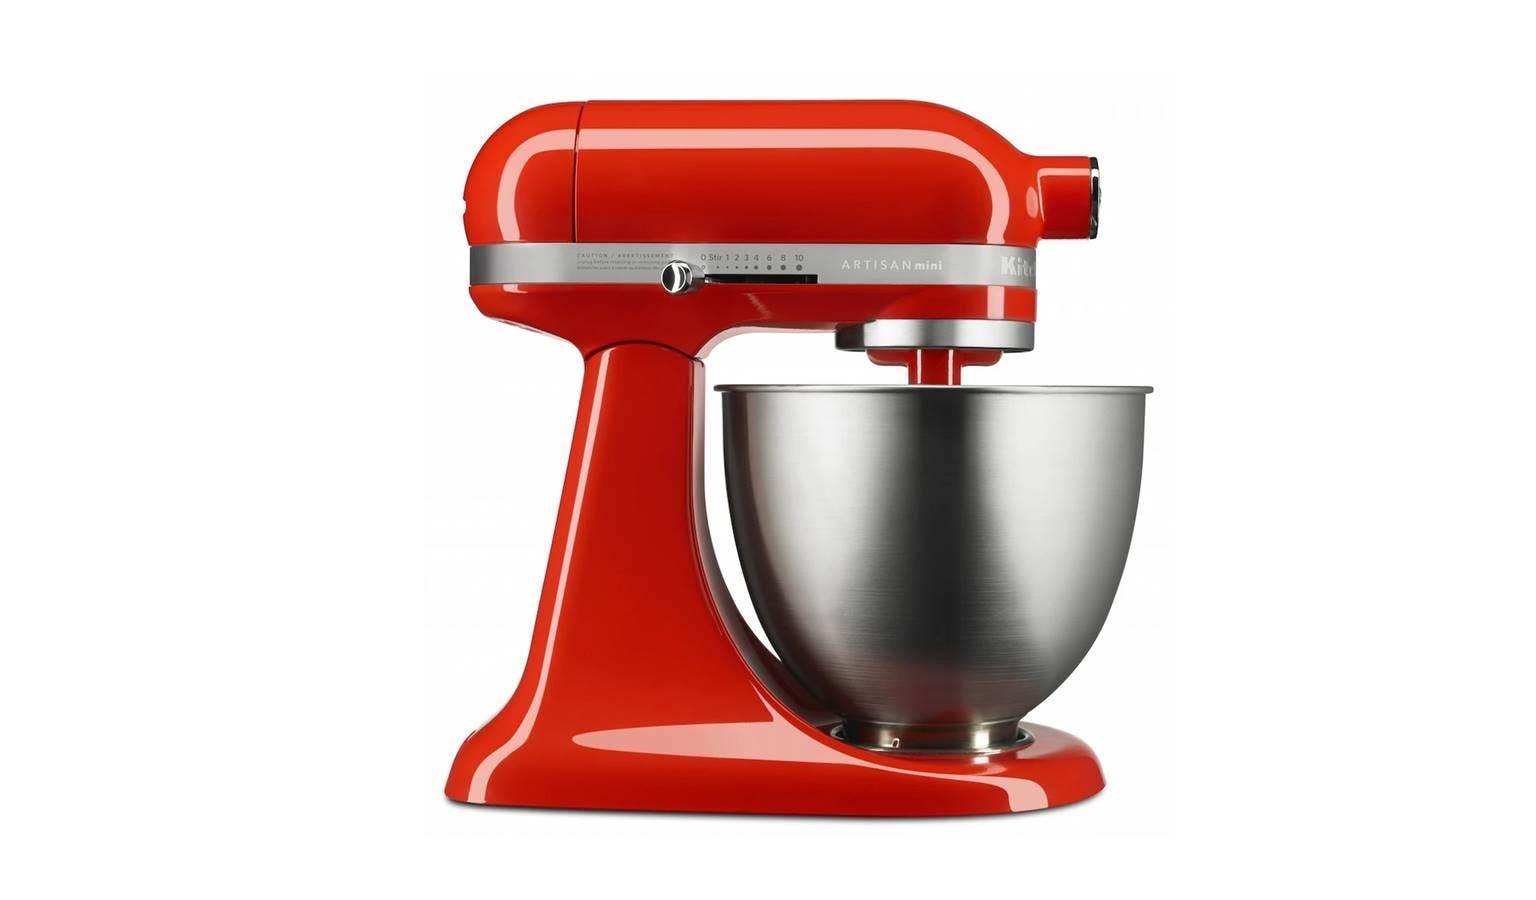 Kitchenaid Artisan Mini 3 3 L Quart Tilt Head Stand Mixer Hot Sauce Harvey Norman Malaysia